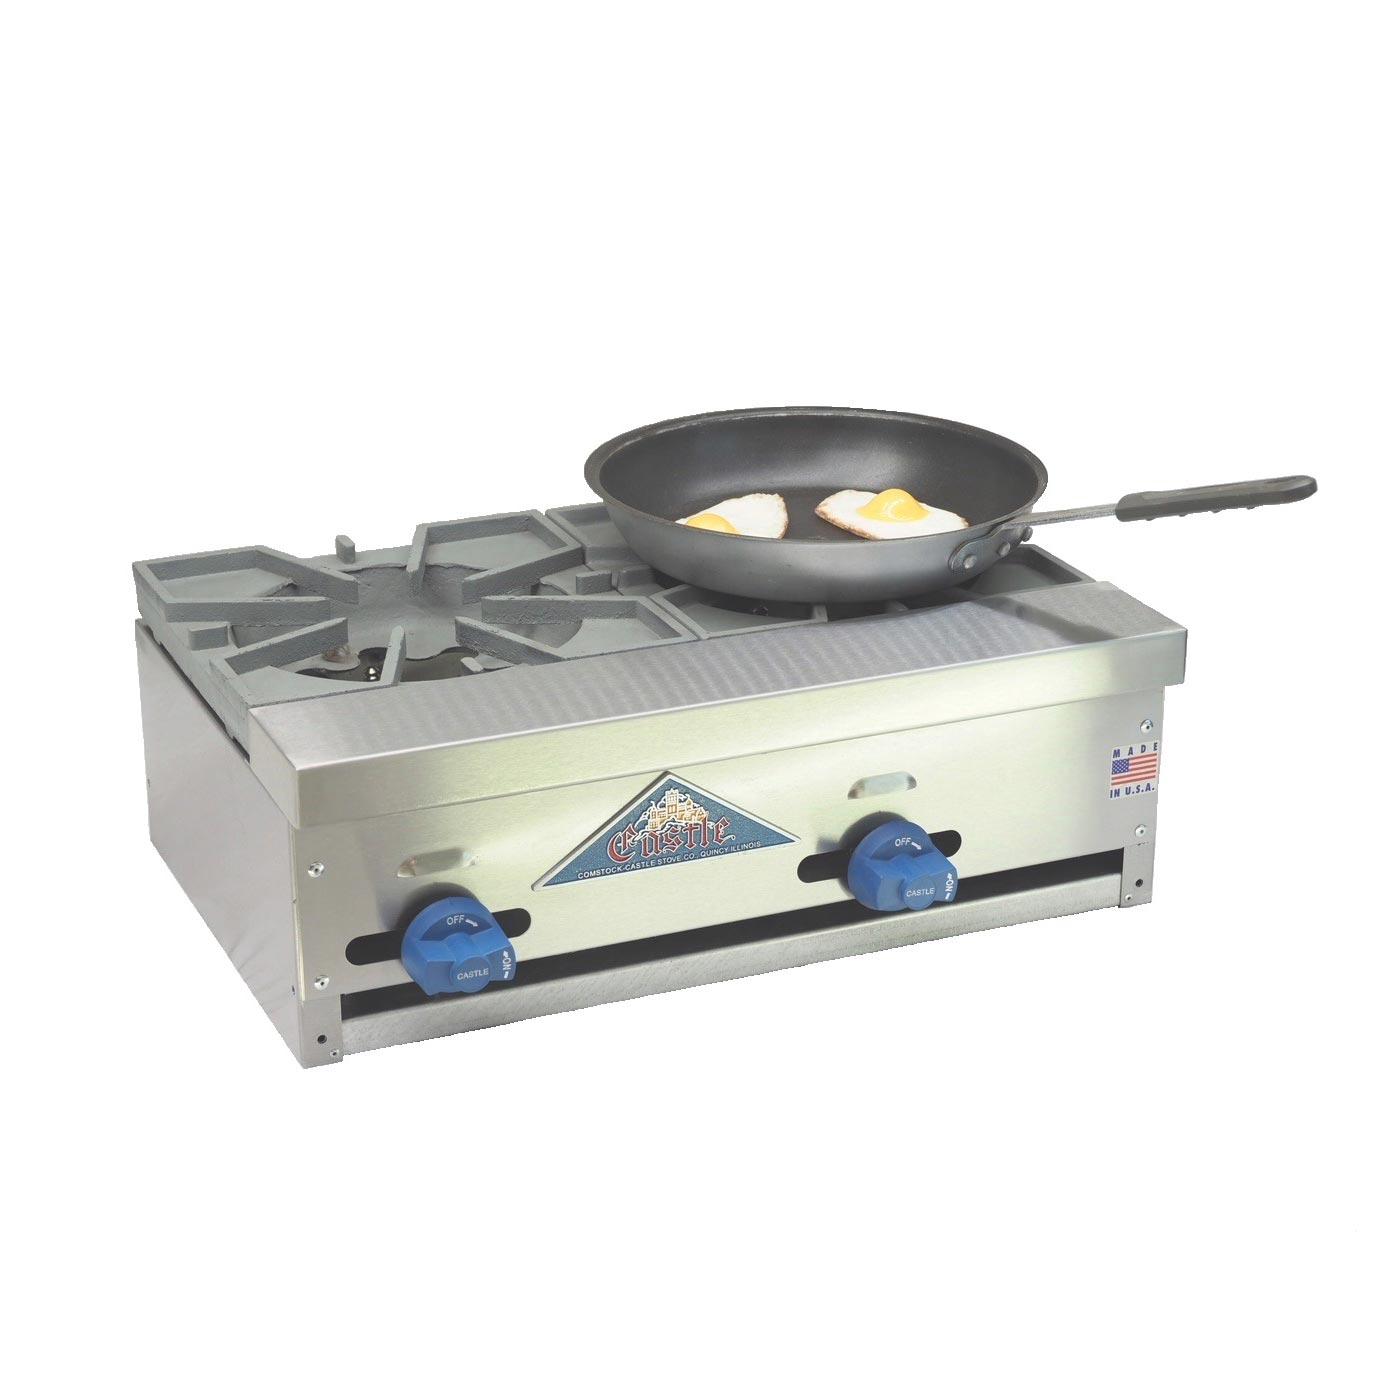 Comstock-Castle FHP24-1LB charbroiler / hotplate, gas, countertop